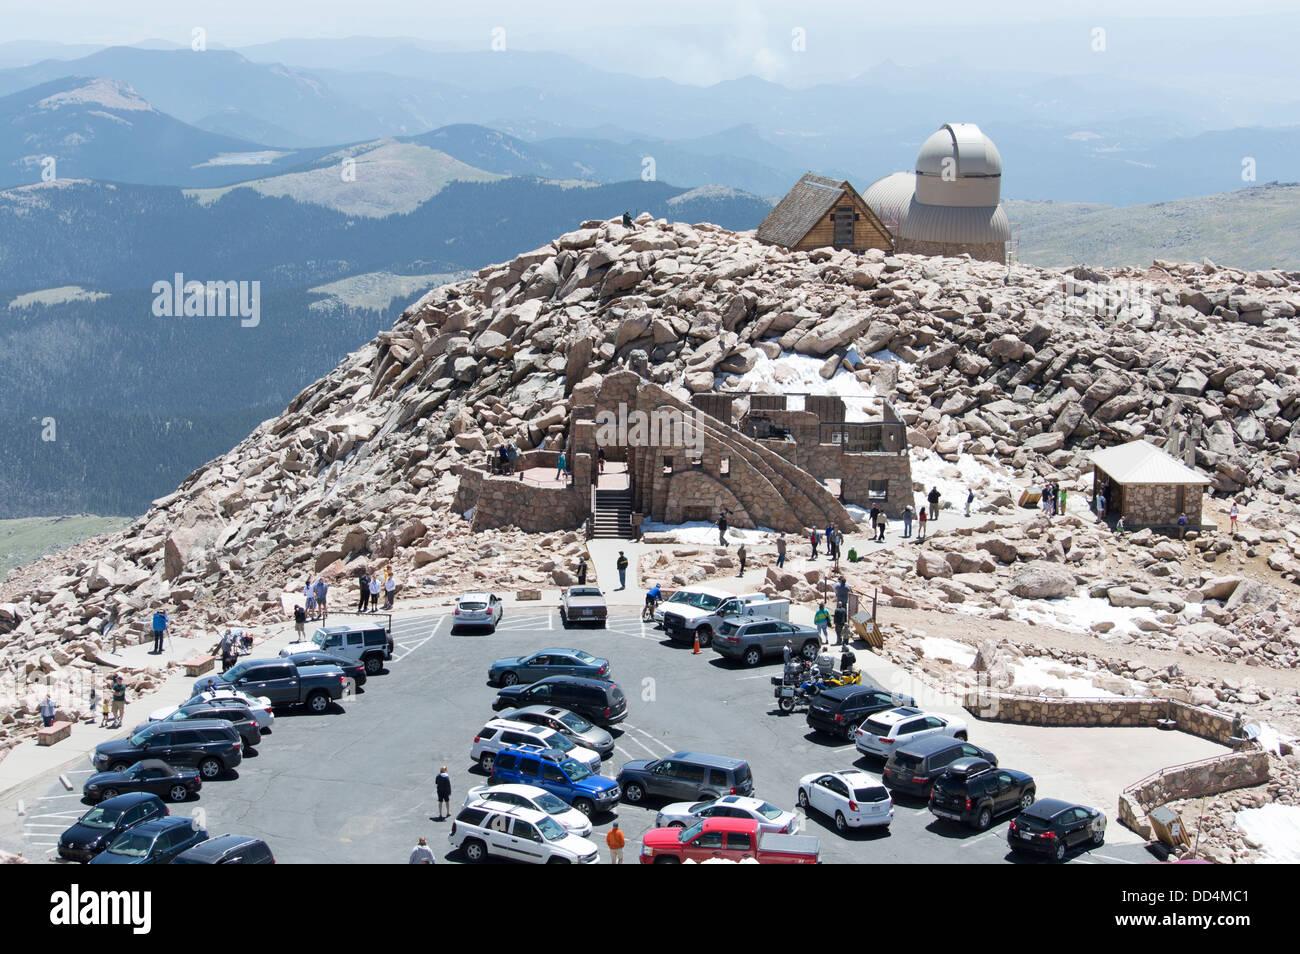 The summit of Mount Evans, near Denver, Colorado, USA - Stock Image